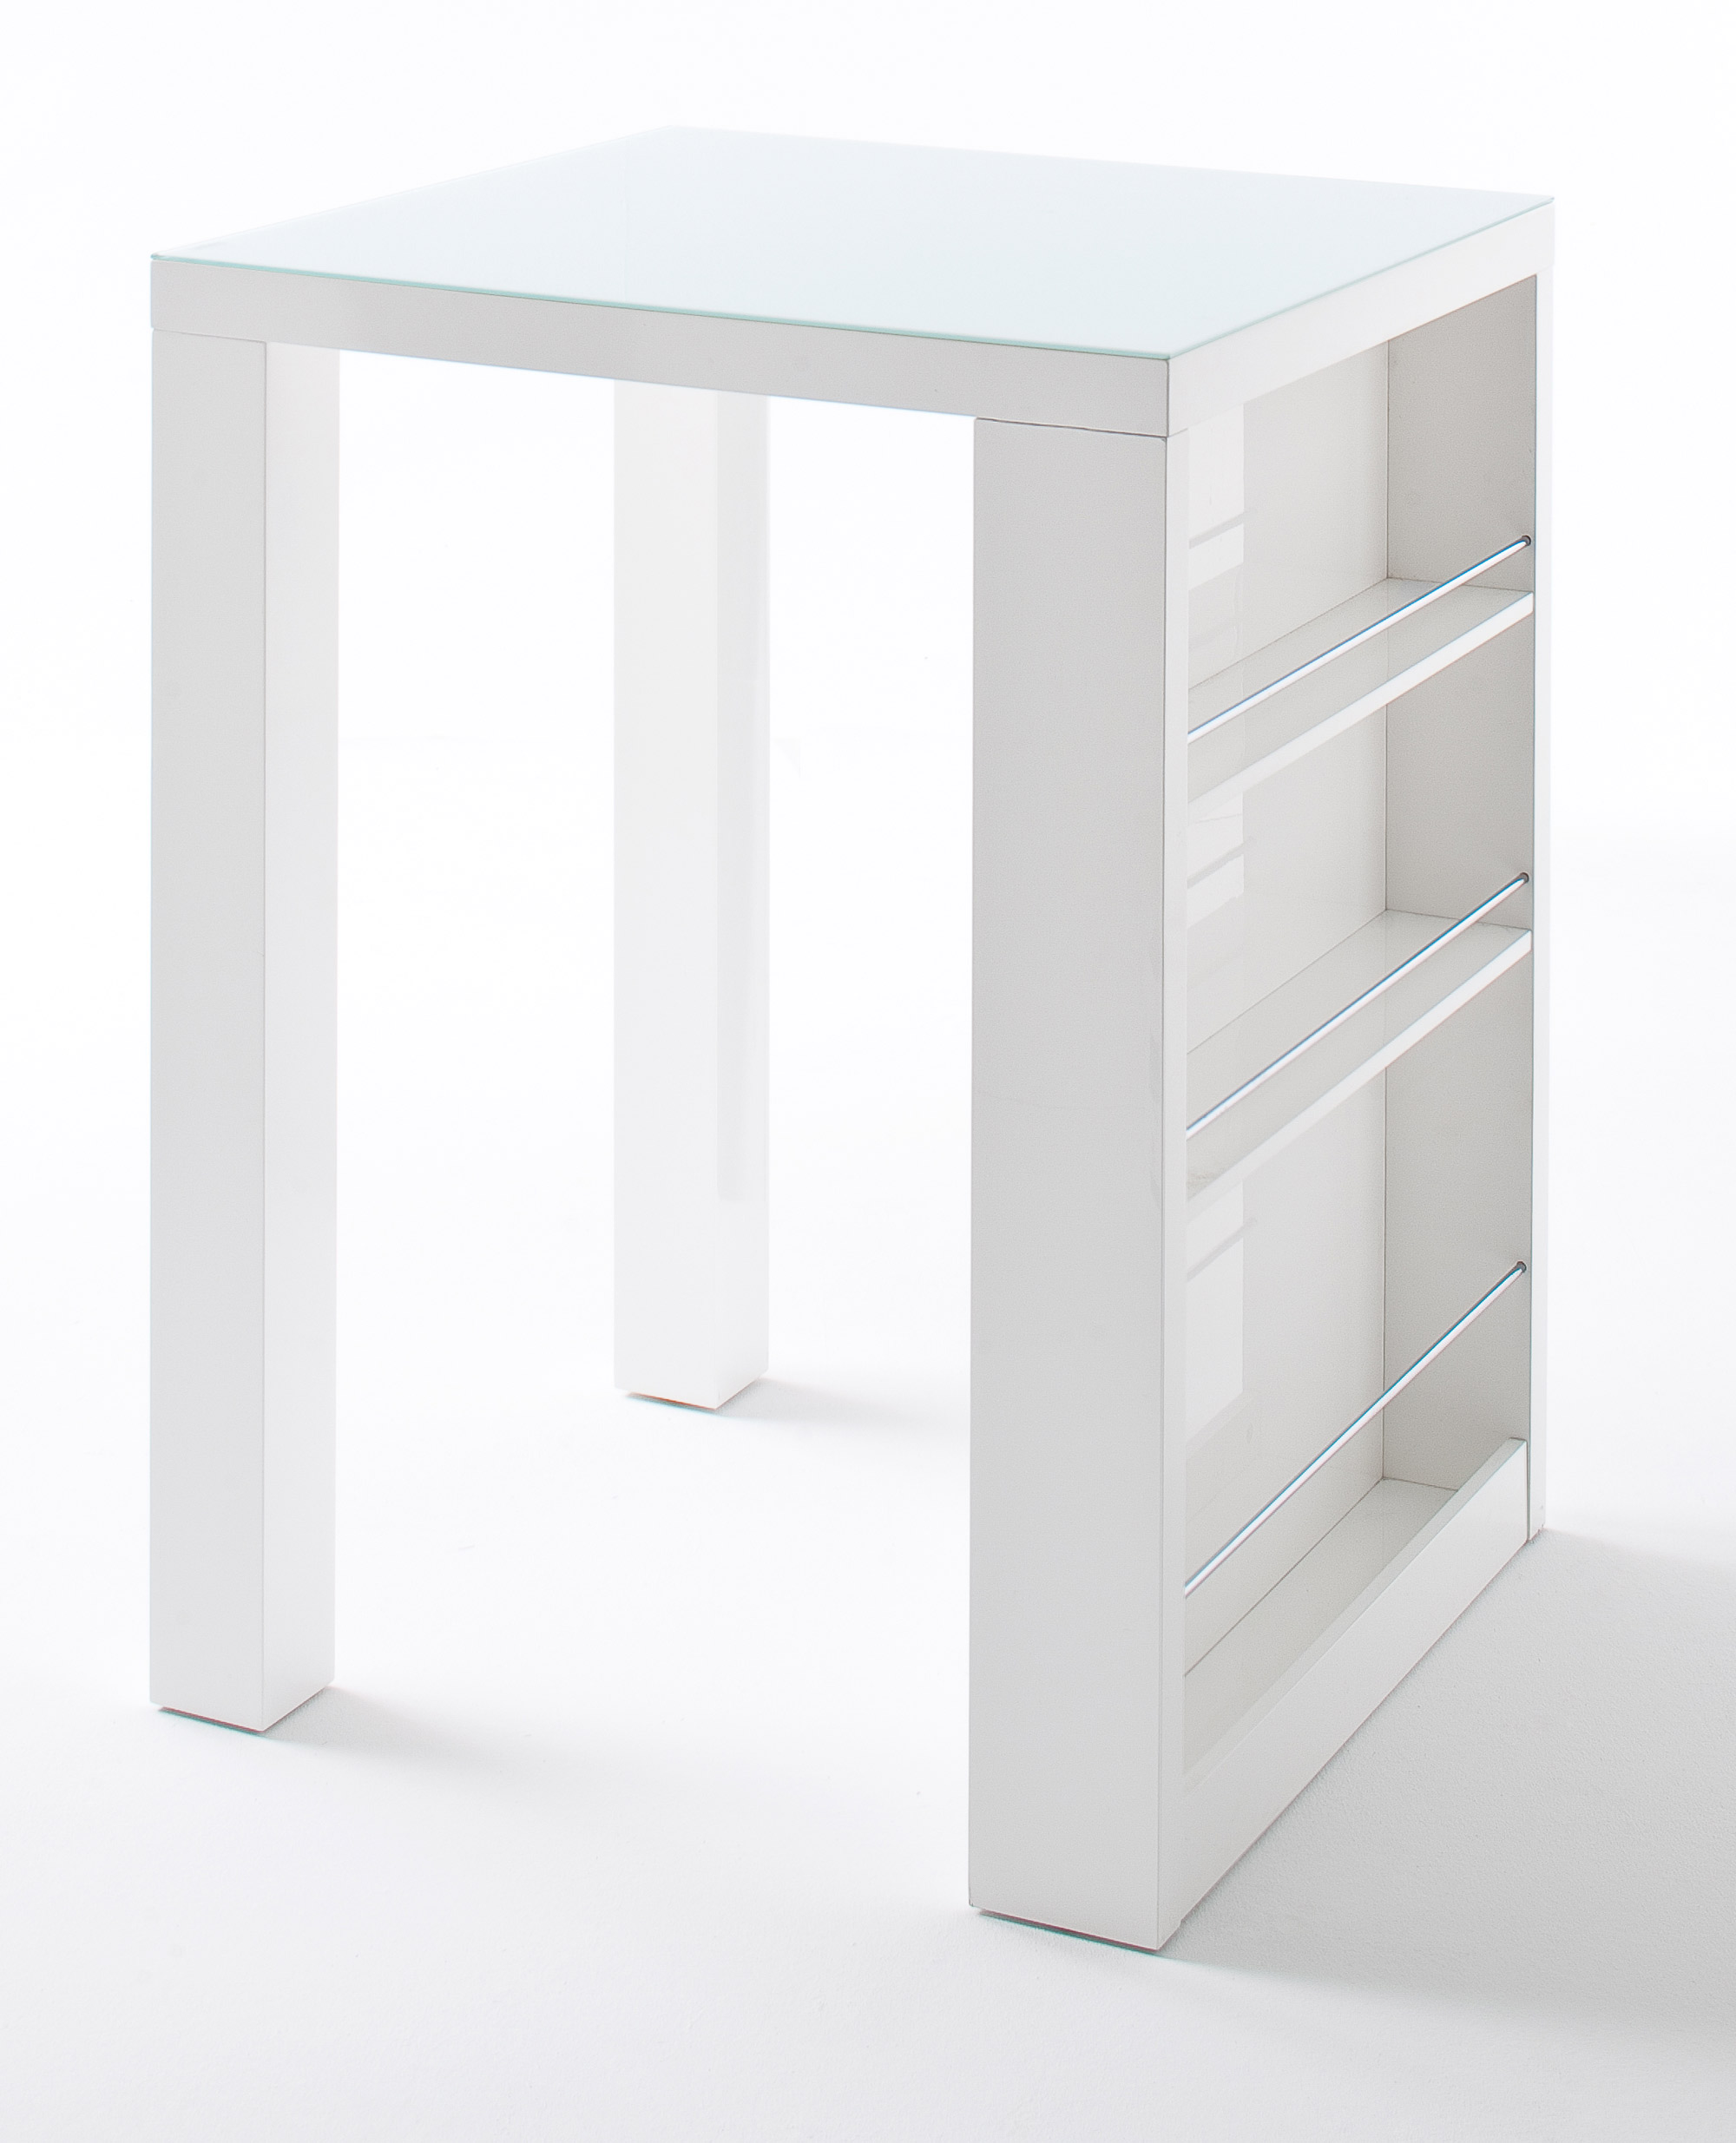 Hoogglans Keuken Krassen : Bartafel Royal Glass – L80 x B80 x H107 cm – Hoogglans wit bestellen